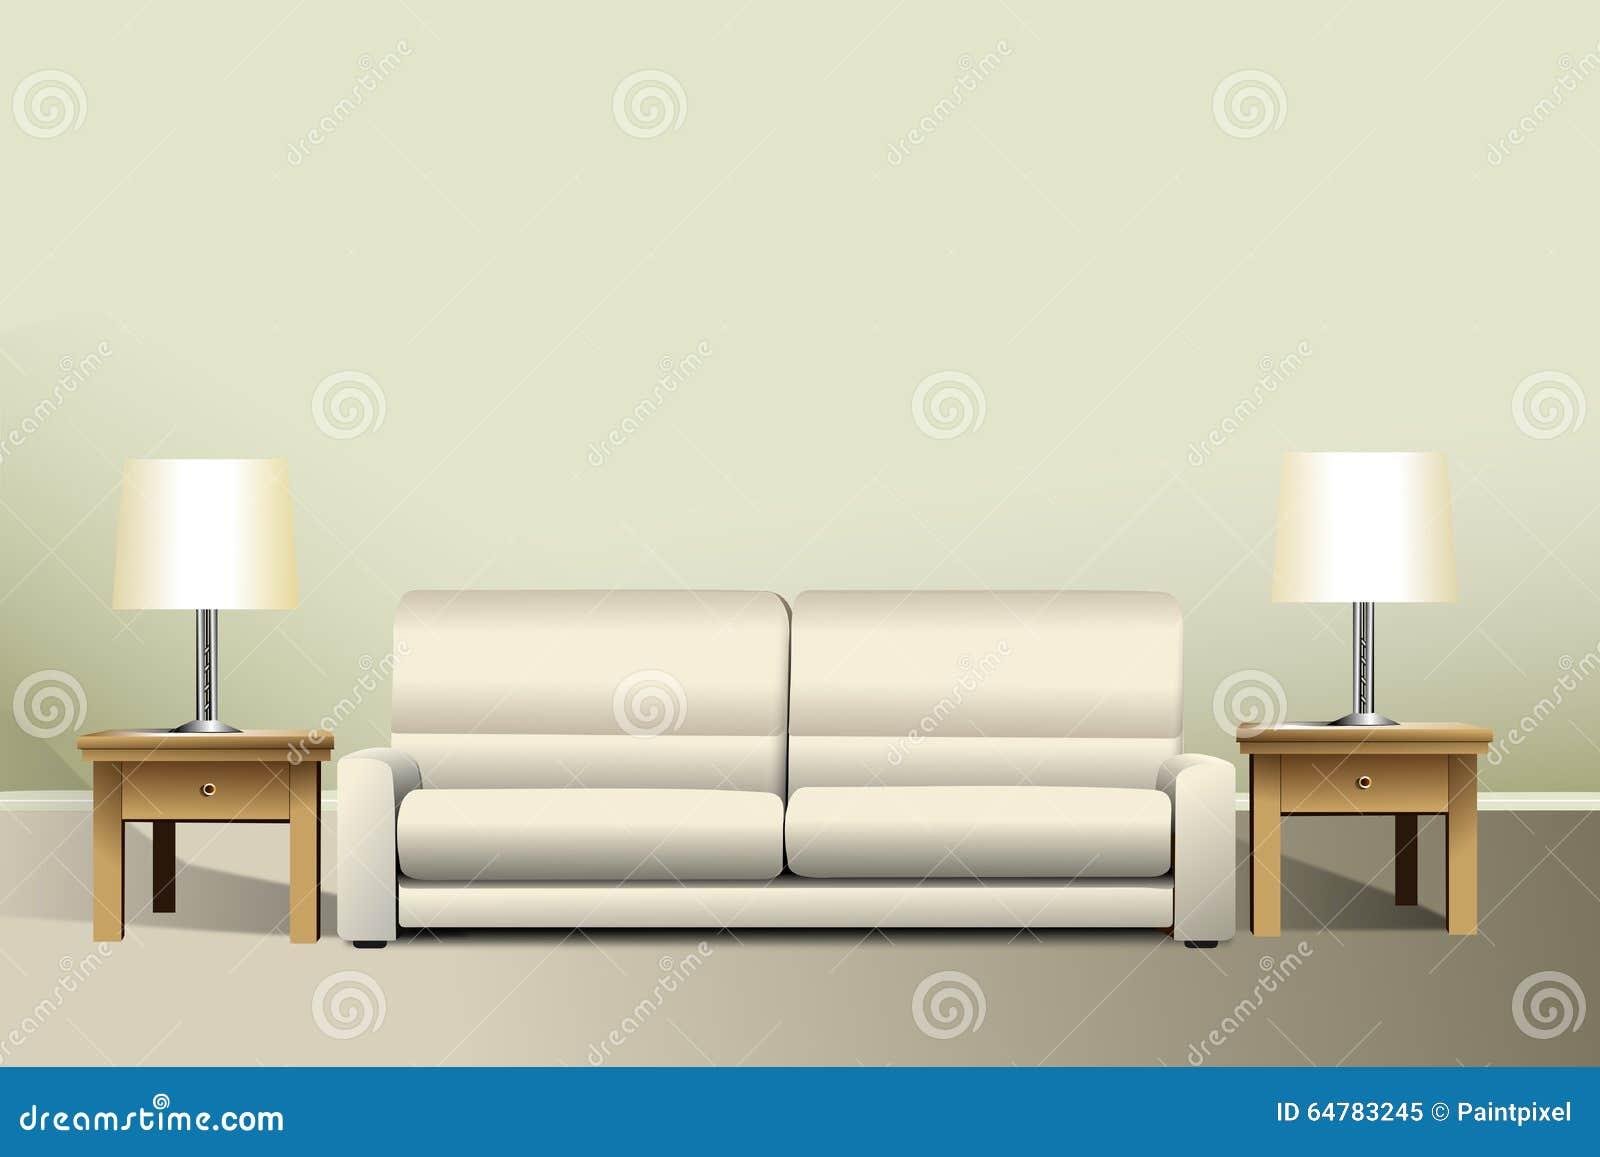 Living Room Mockup Stock Illustration Image 64783245 : living room mockup interior sofa two end lamp tables 64783245 from www.dreamstime.com size 1300 x 957 jpeg 60kB